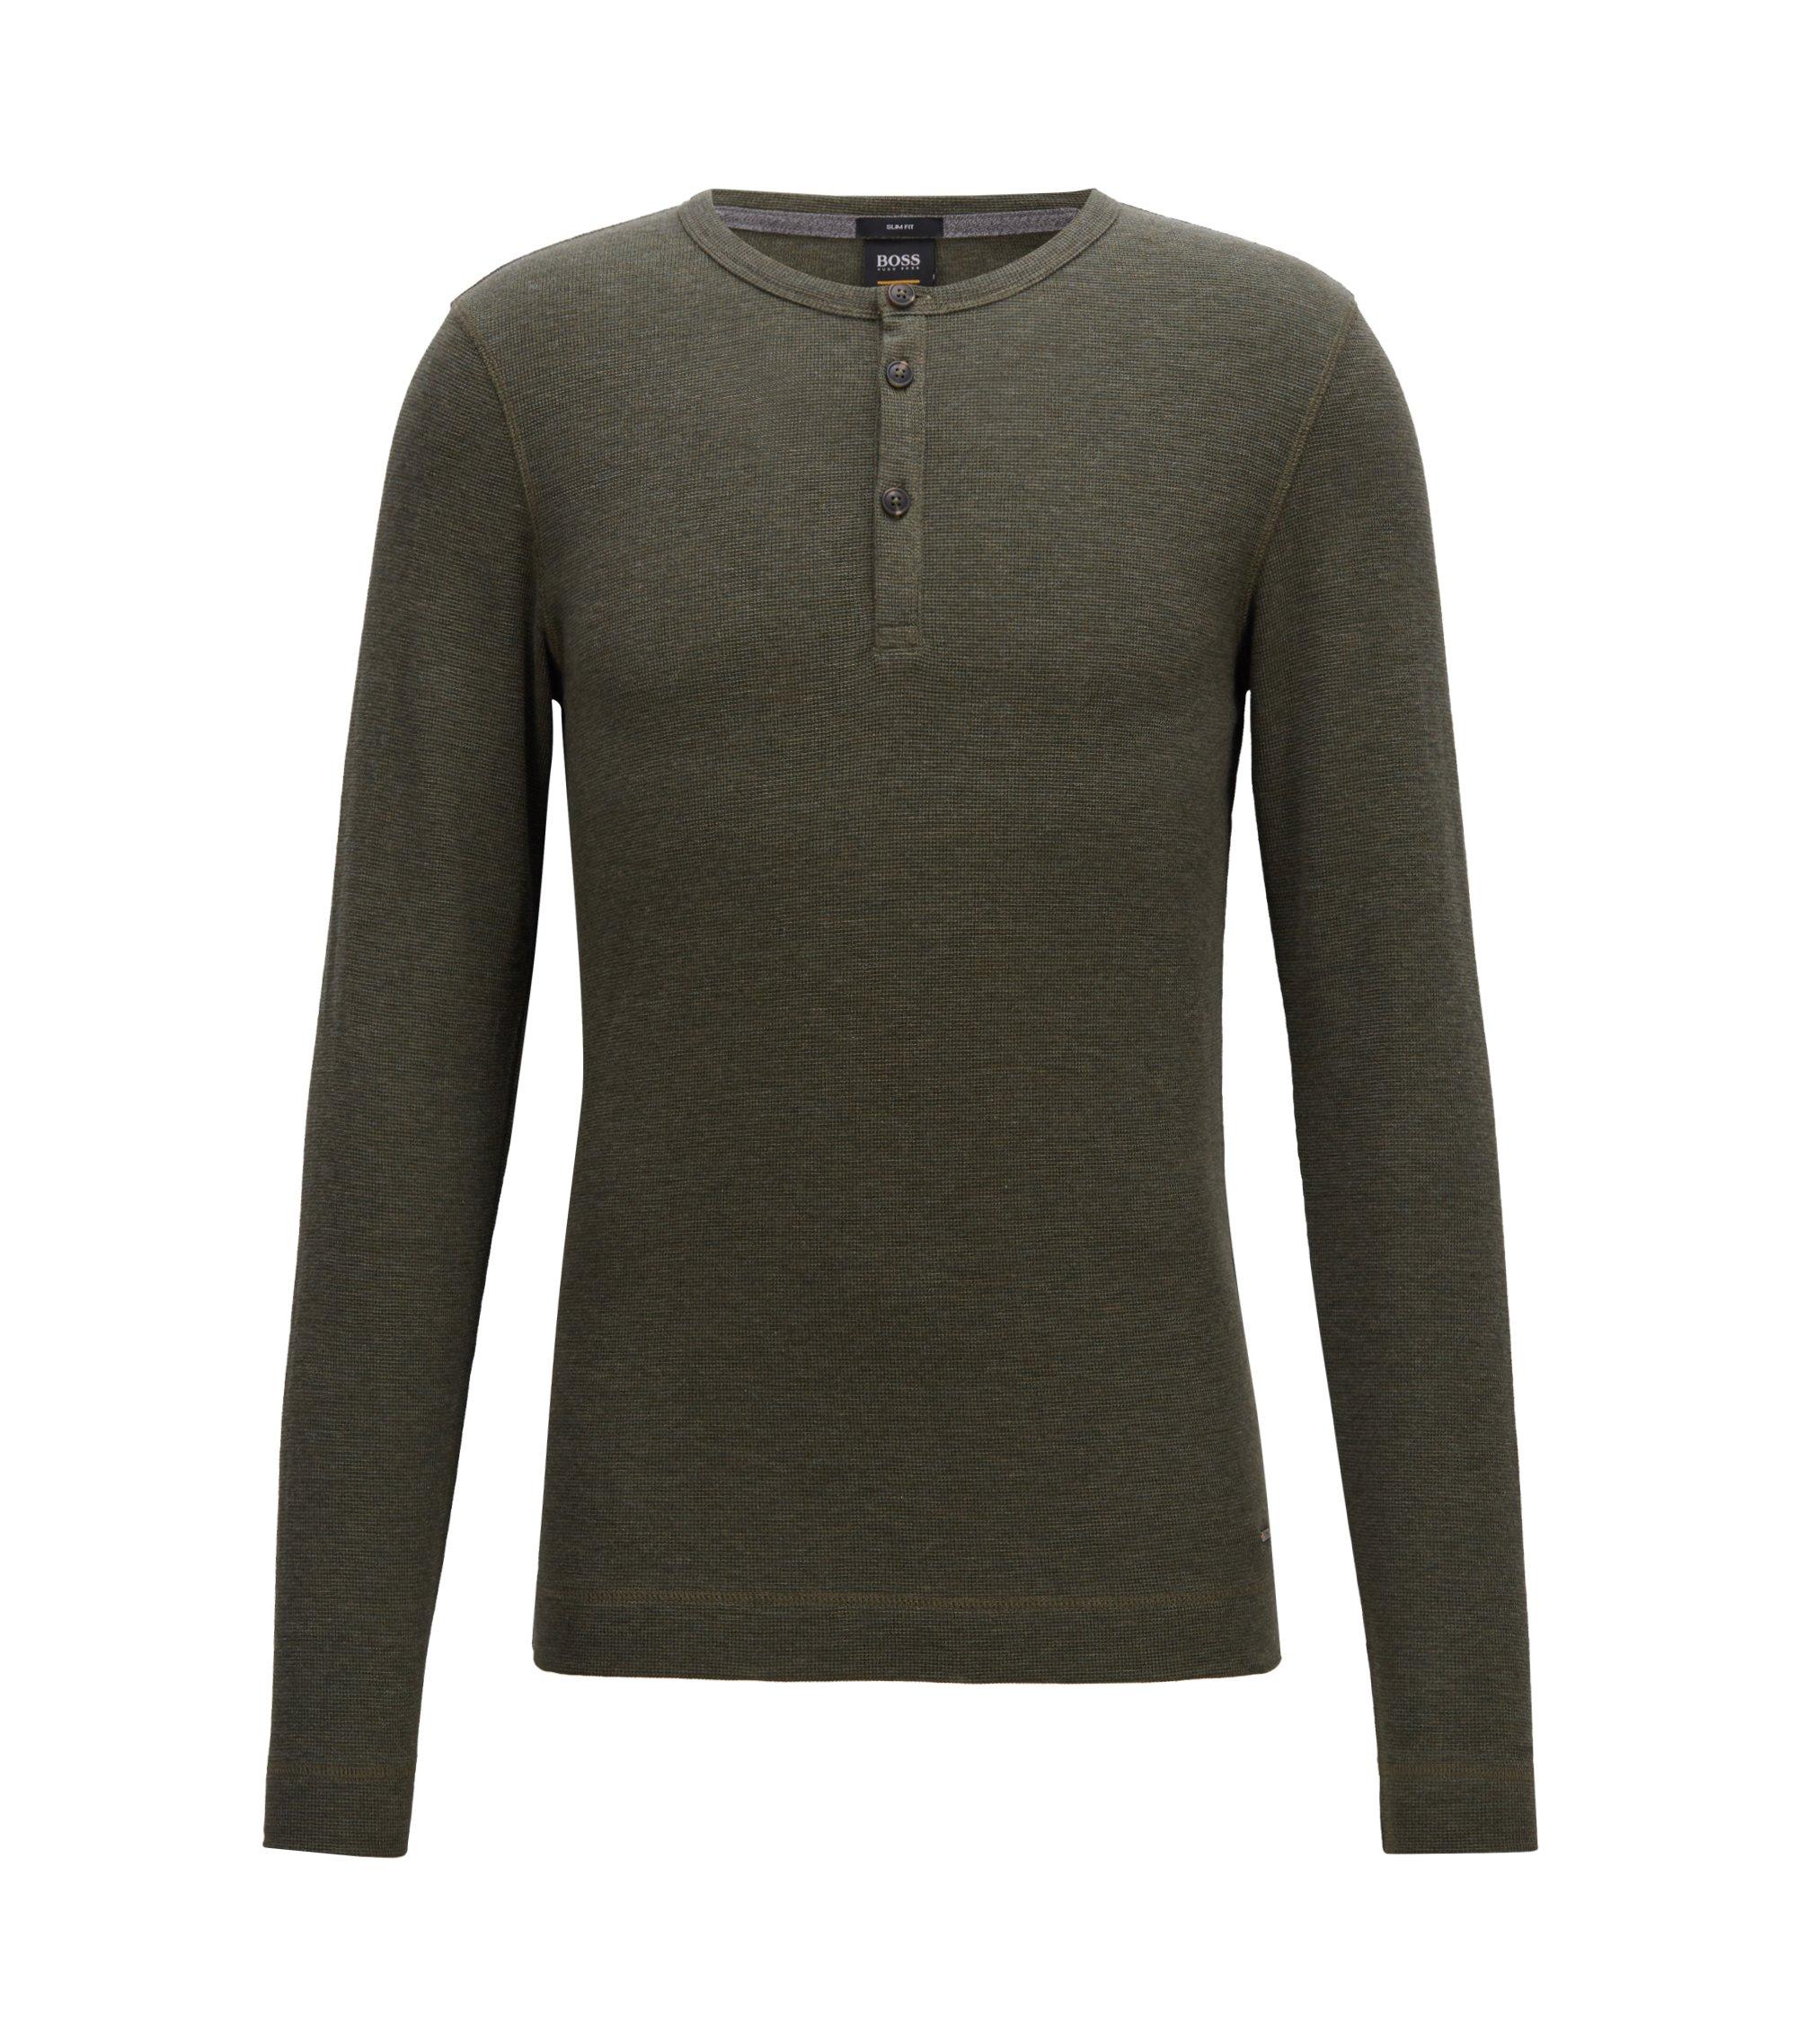 Camiseta slim fit estilo Henley en algodón jaspeado, Verde oscuro